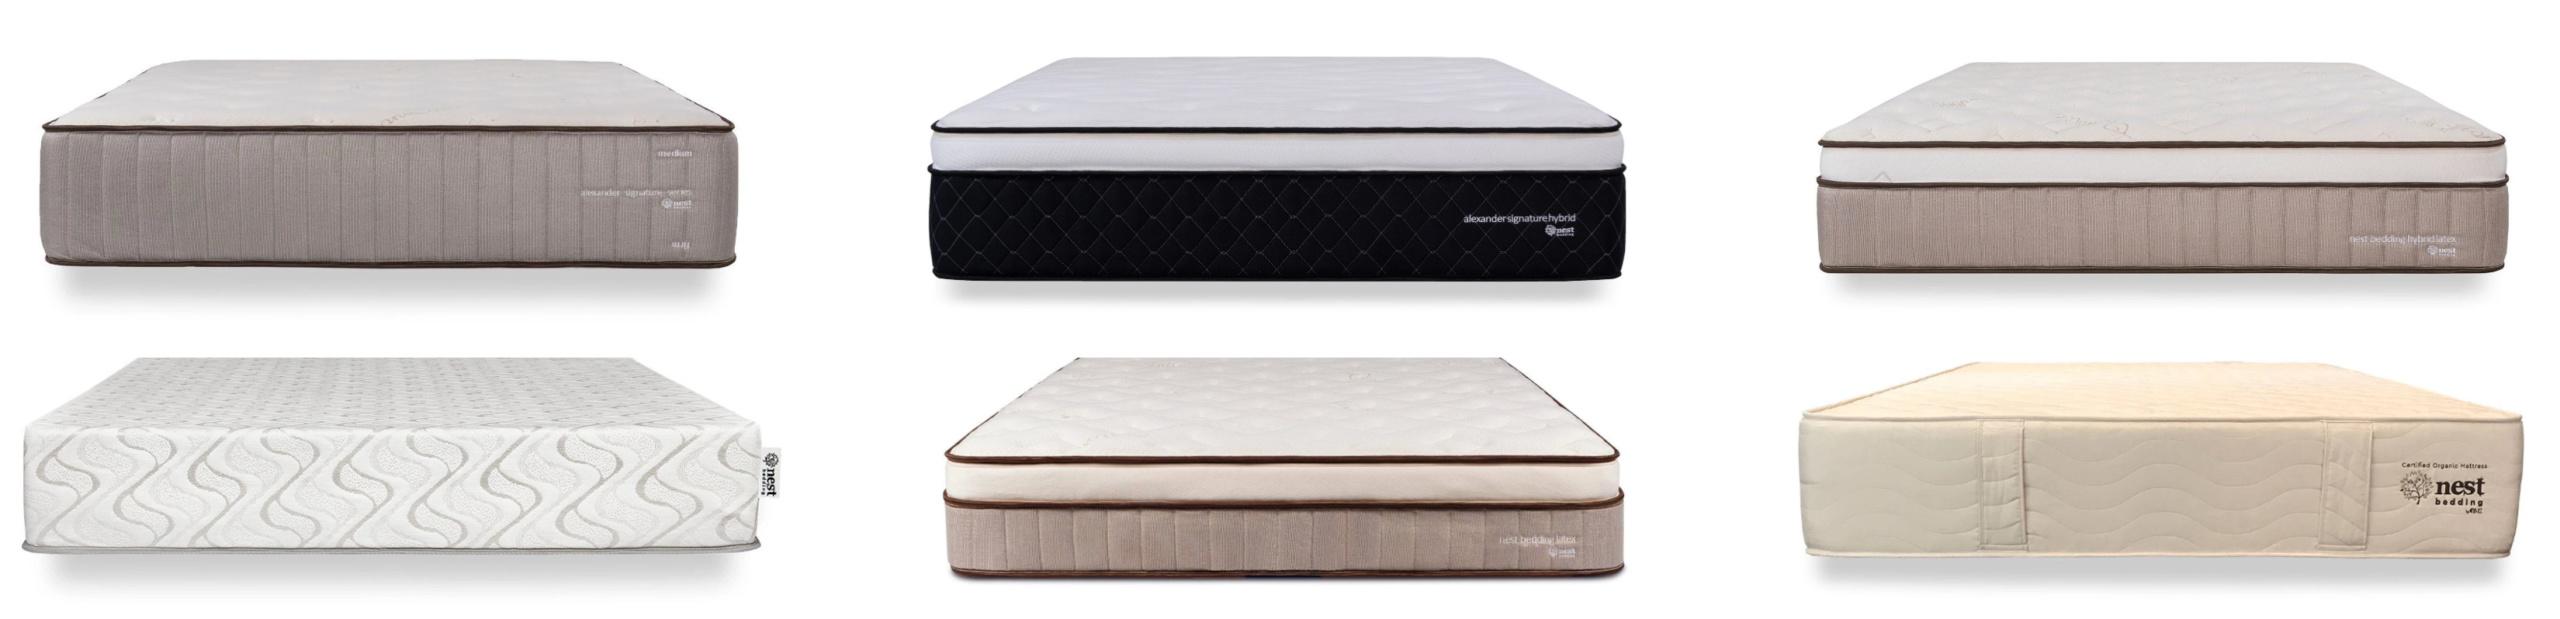 nest bedding mattresses